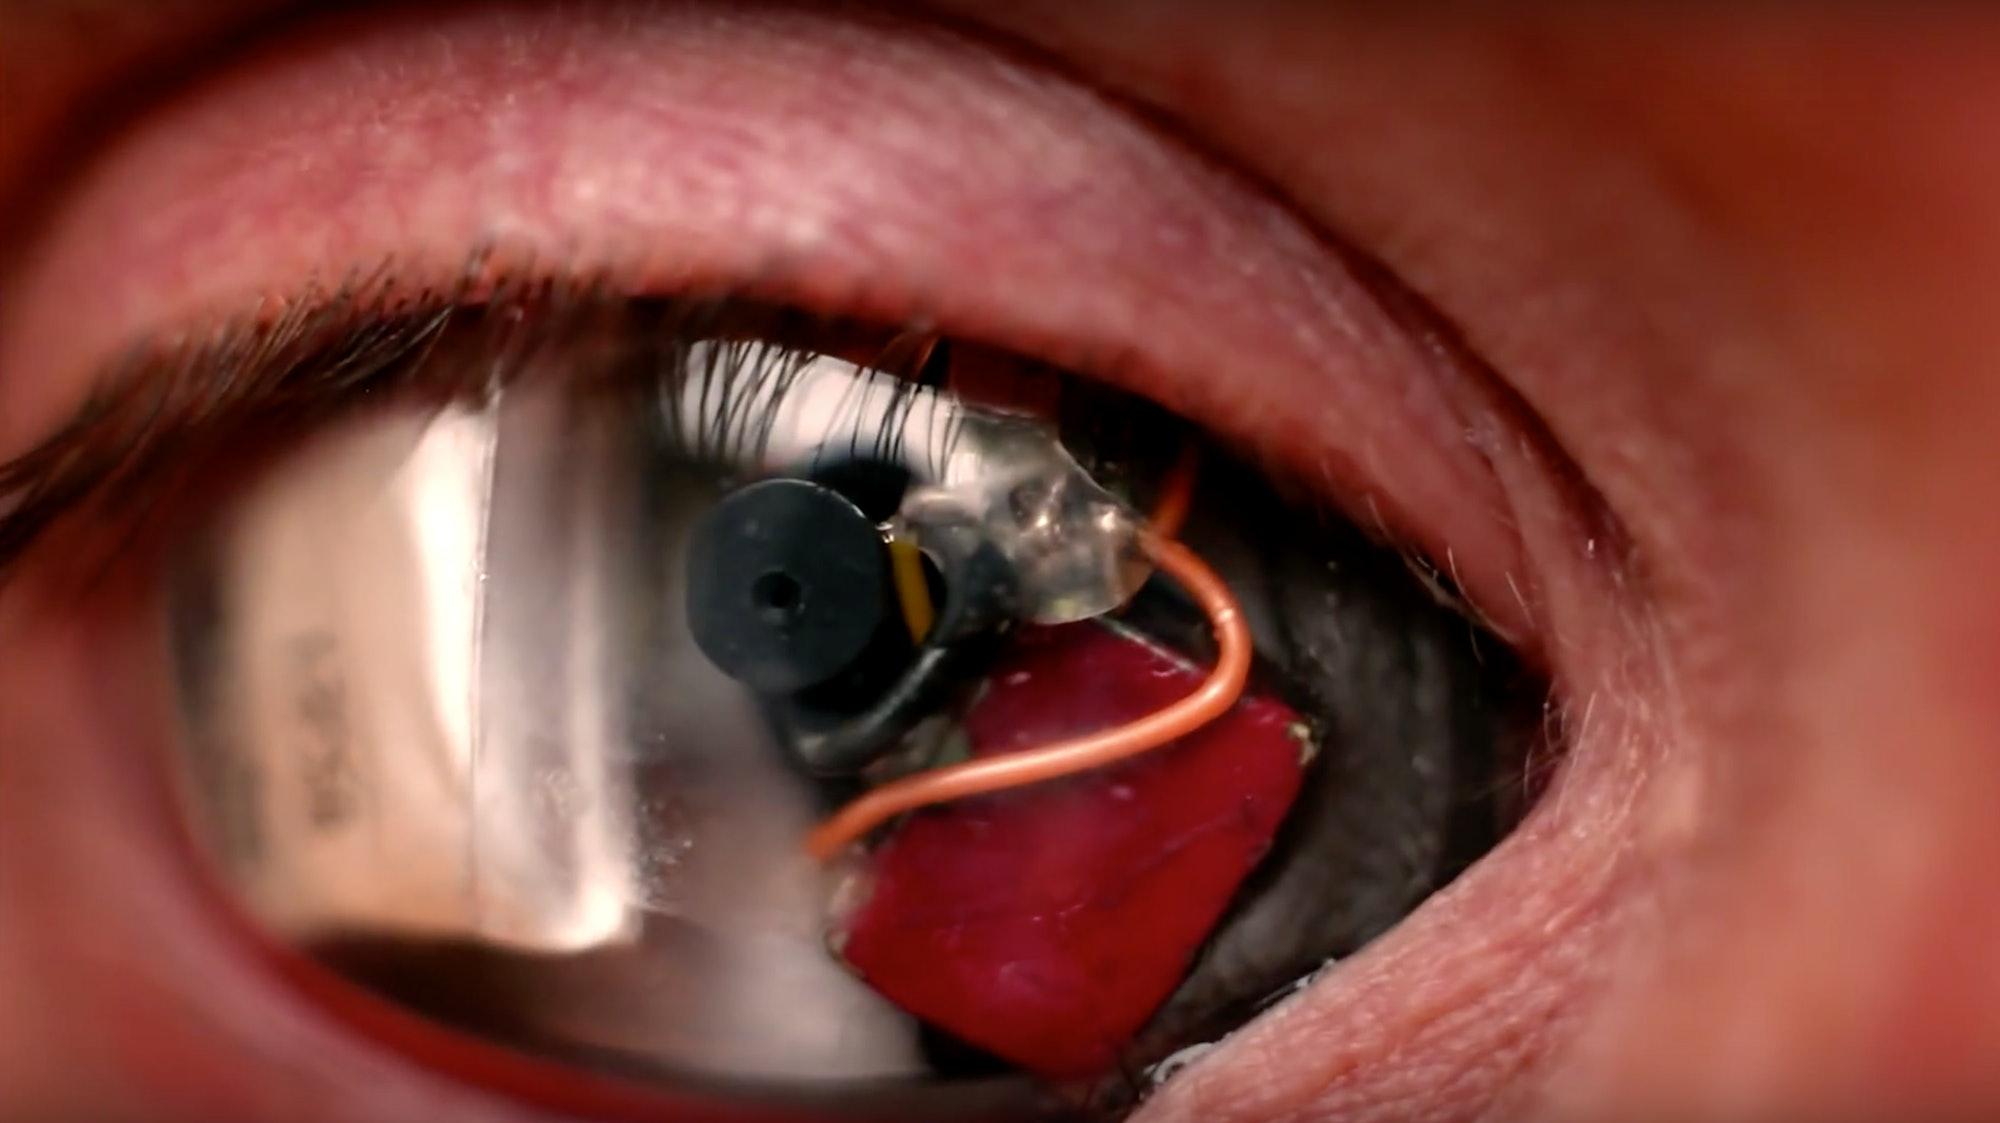 Eyeborg Cyborg Robot Eye Bionic Singularity Neural Lace Rob Spence